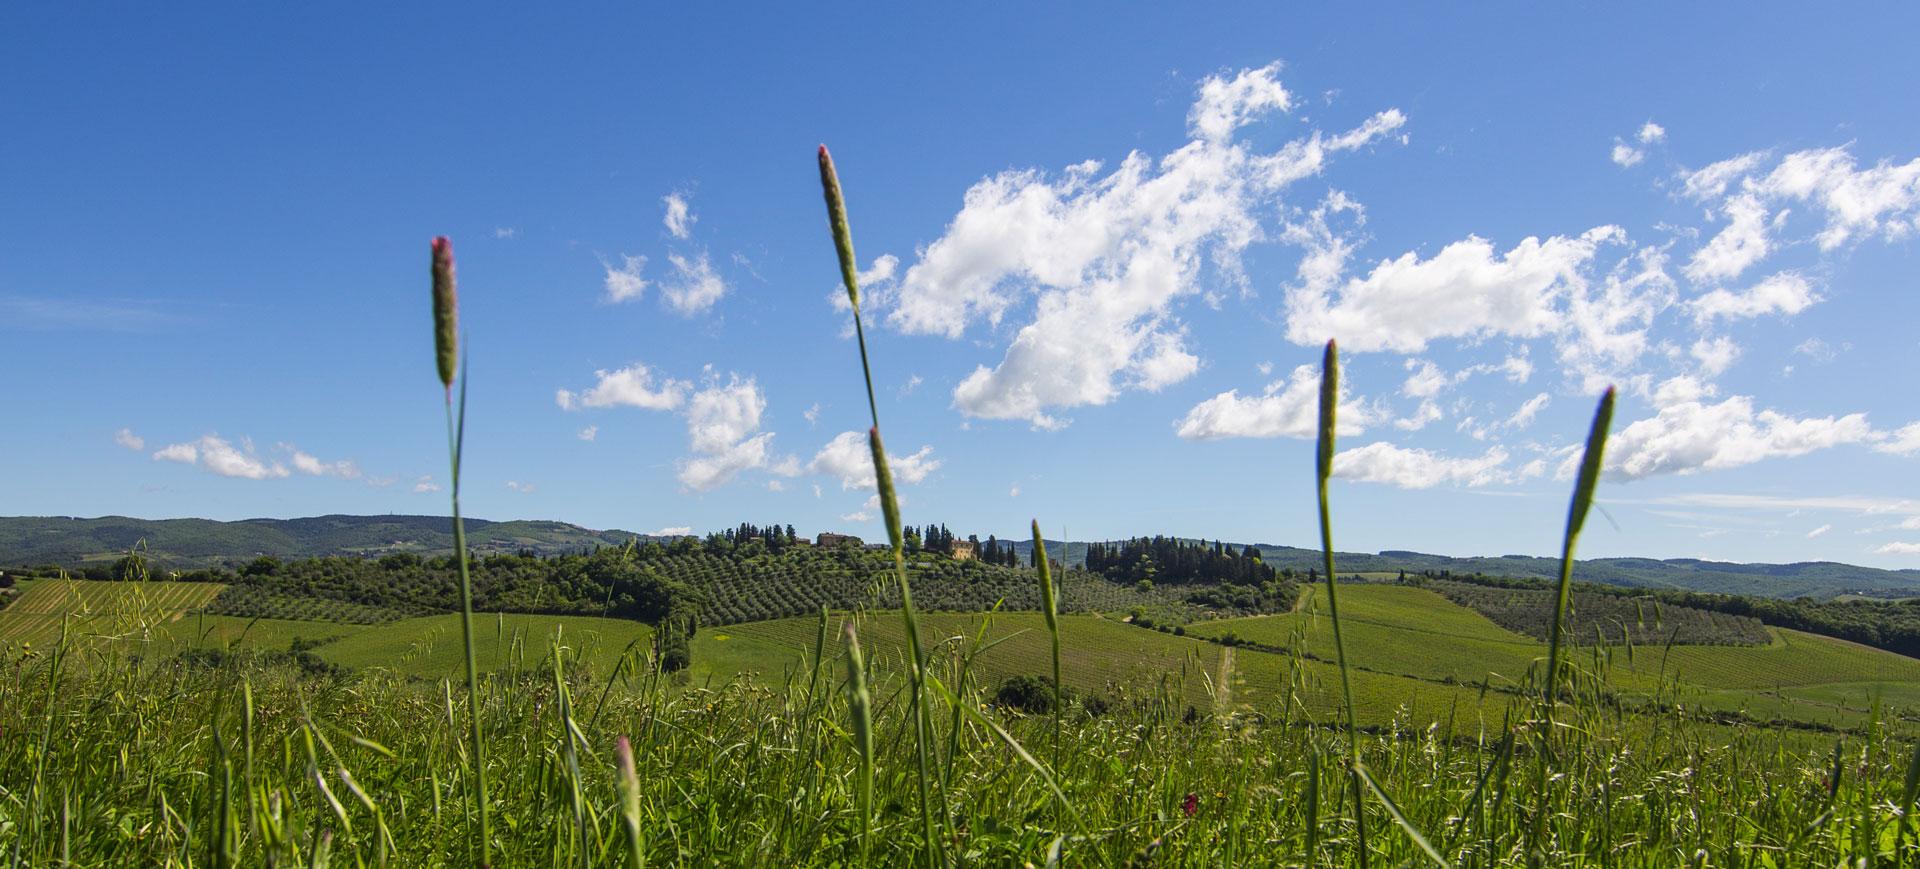 Panorama Tenuta di Bibbiano, Toscana, Chianti Classico.